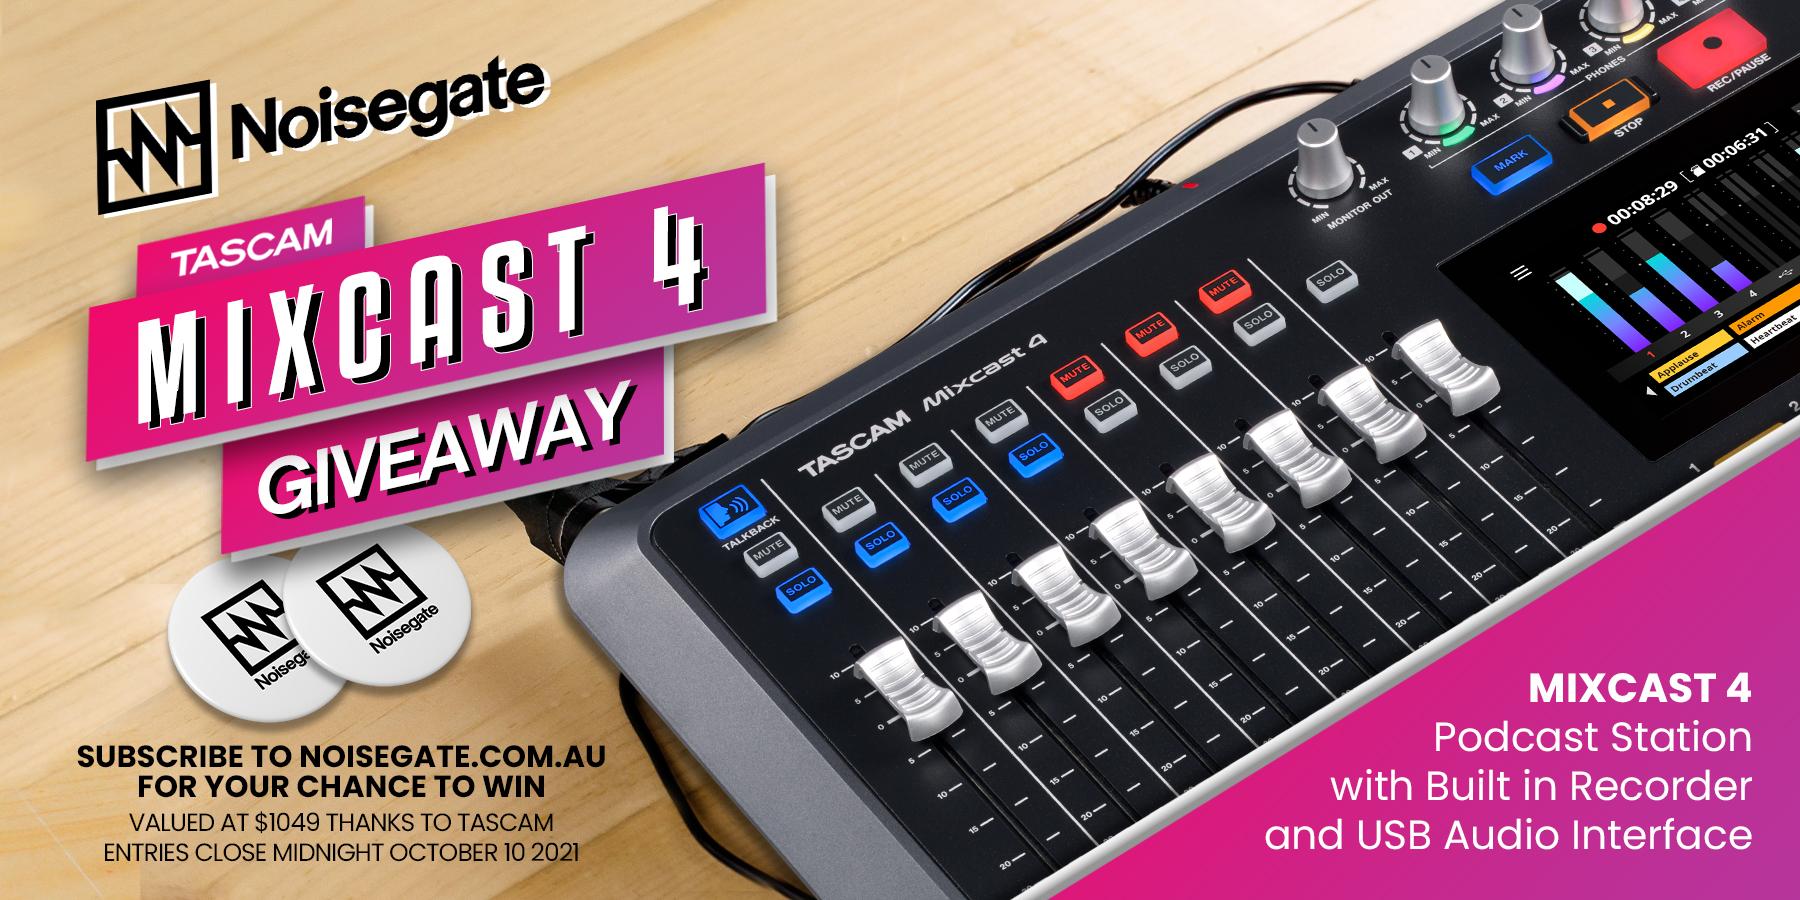 Mixcast 4 Giveaway